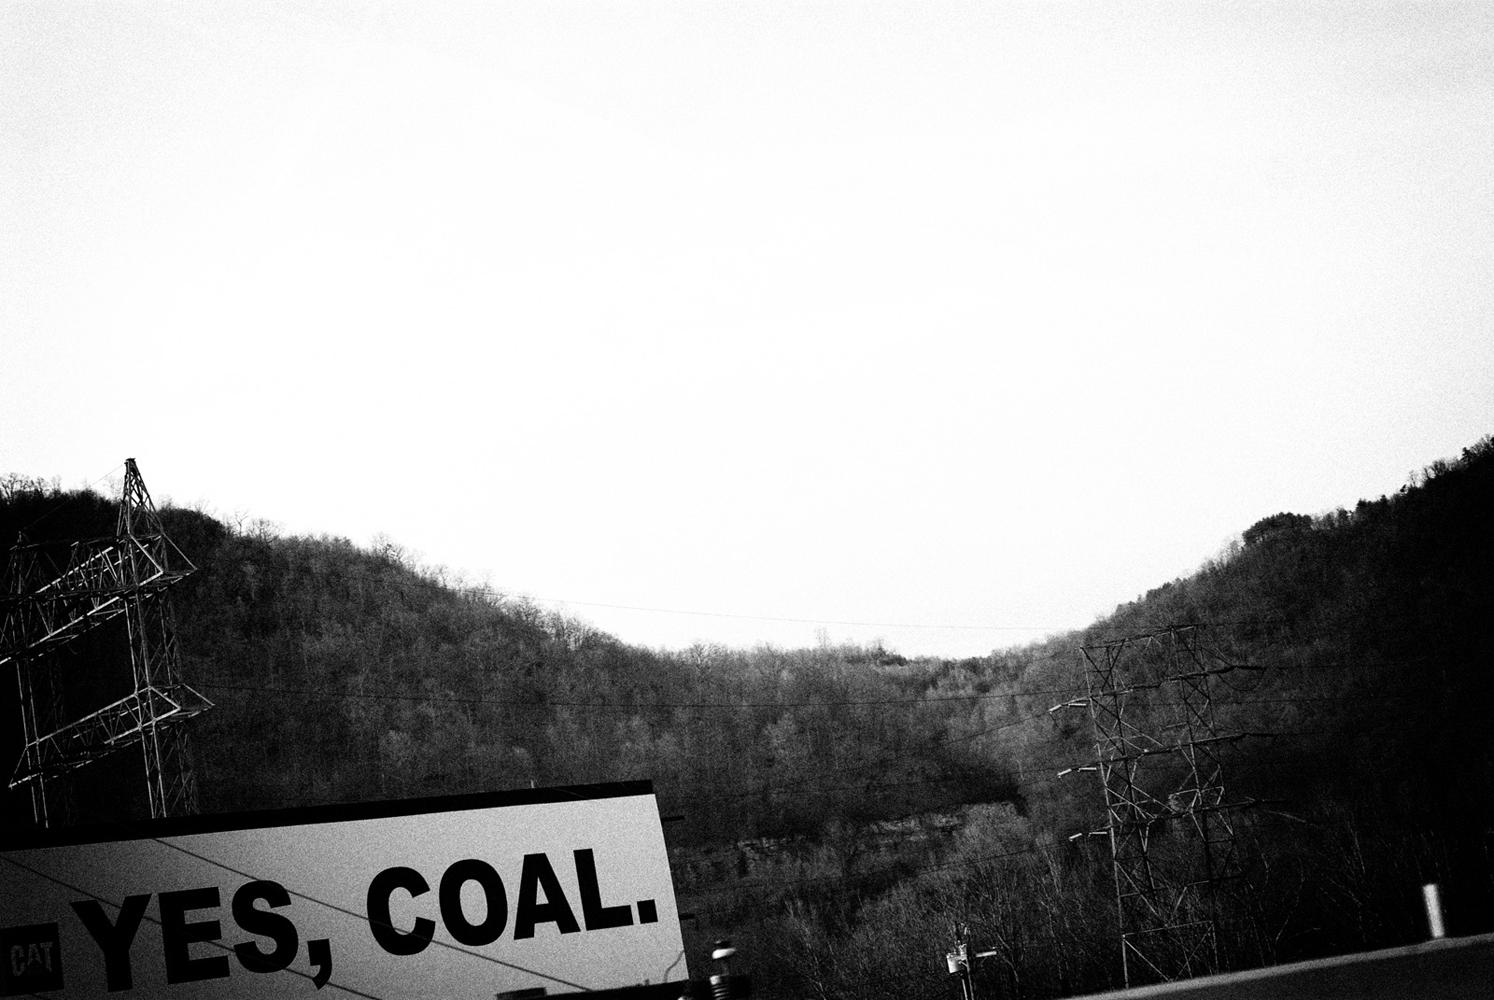 Near Charleston, Kanawha County, West Virginia. March 2008.